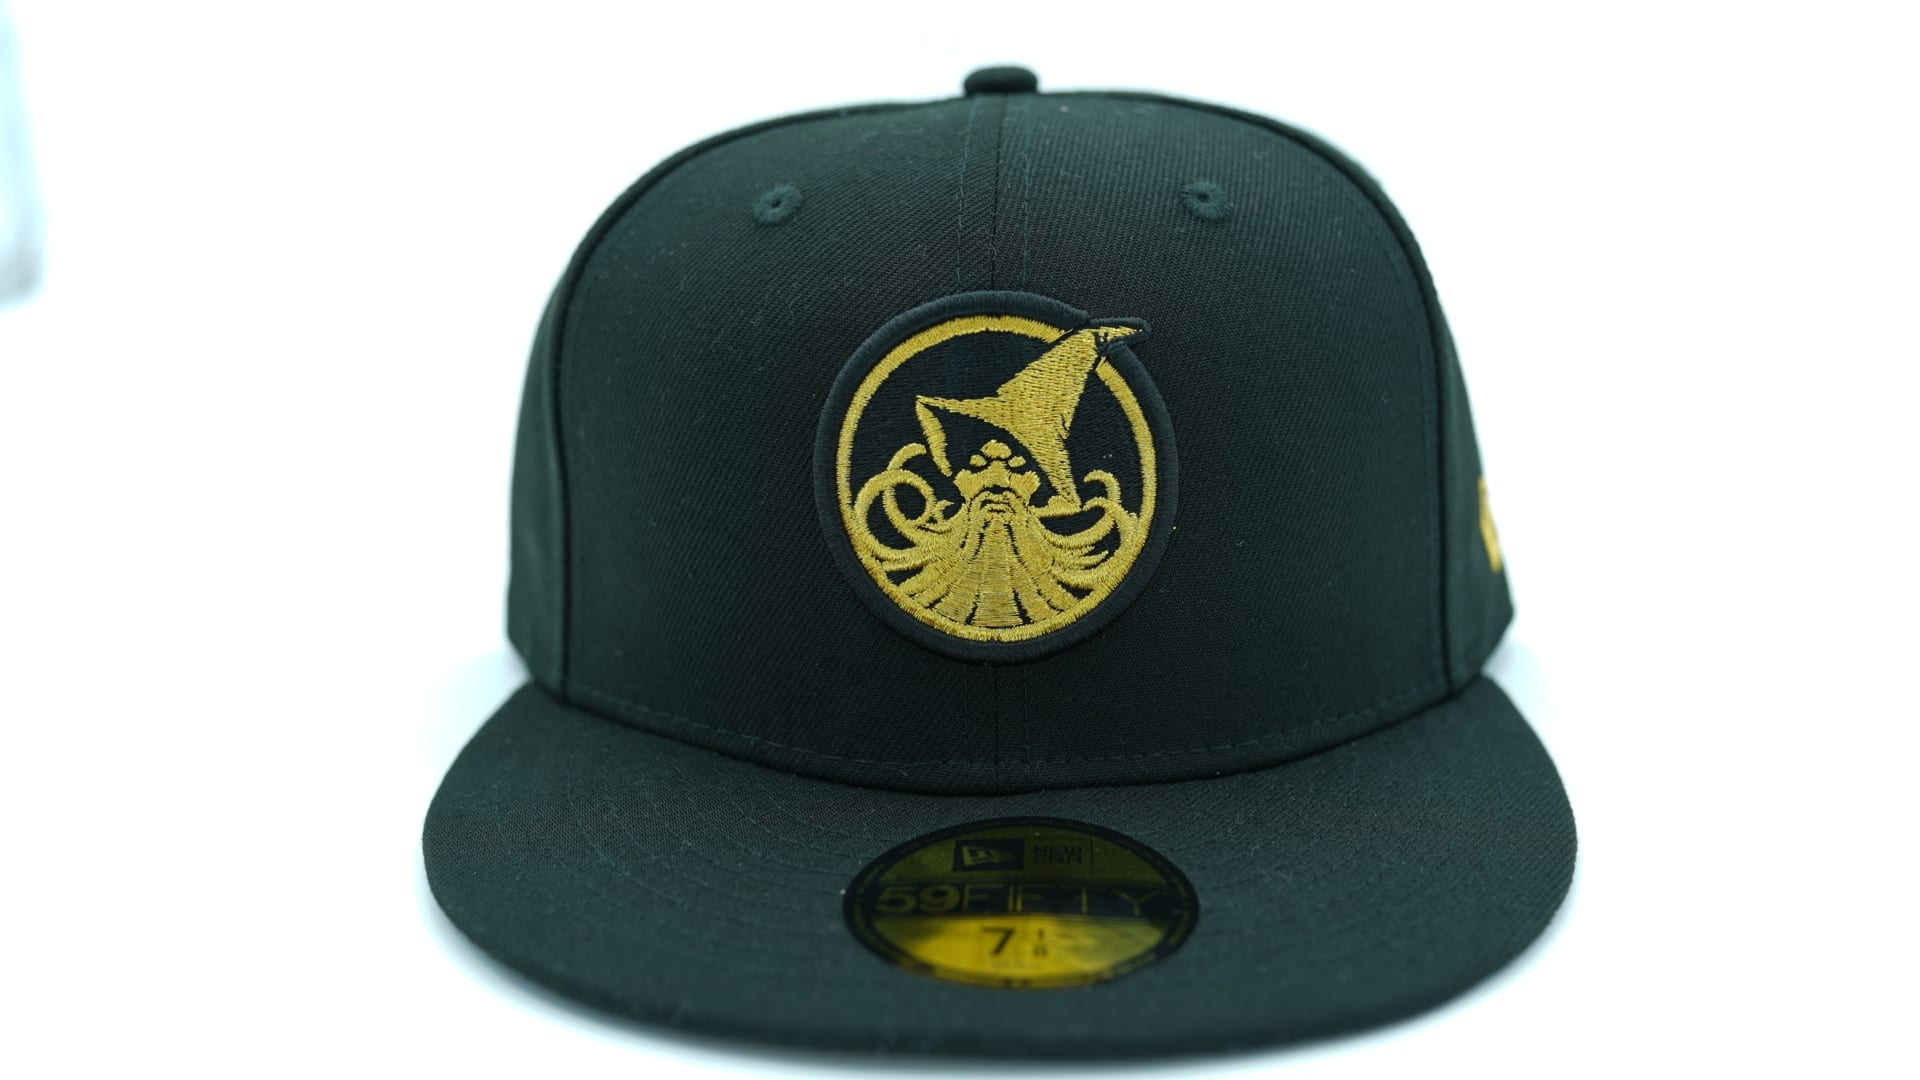 golden state warriors 5x champions 59fifty fitted baseball cap new era nba